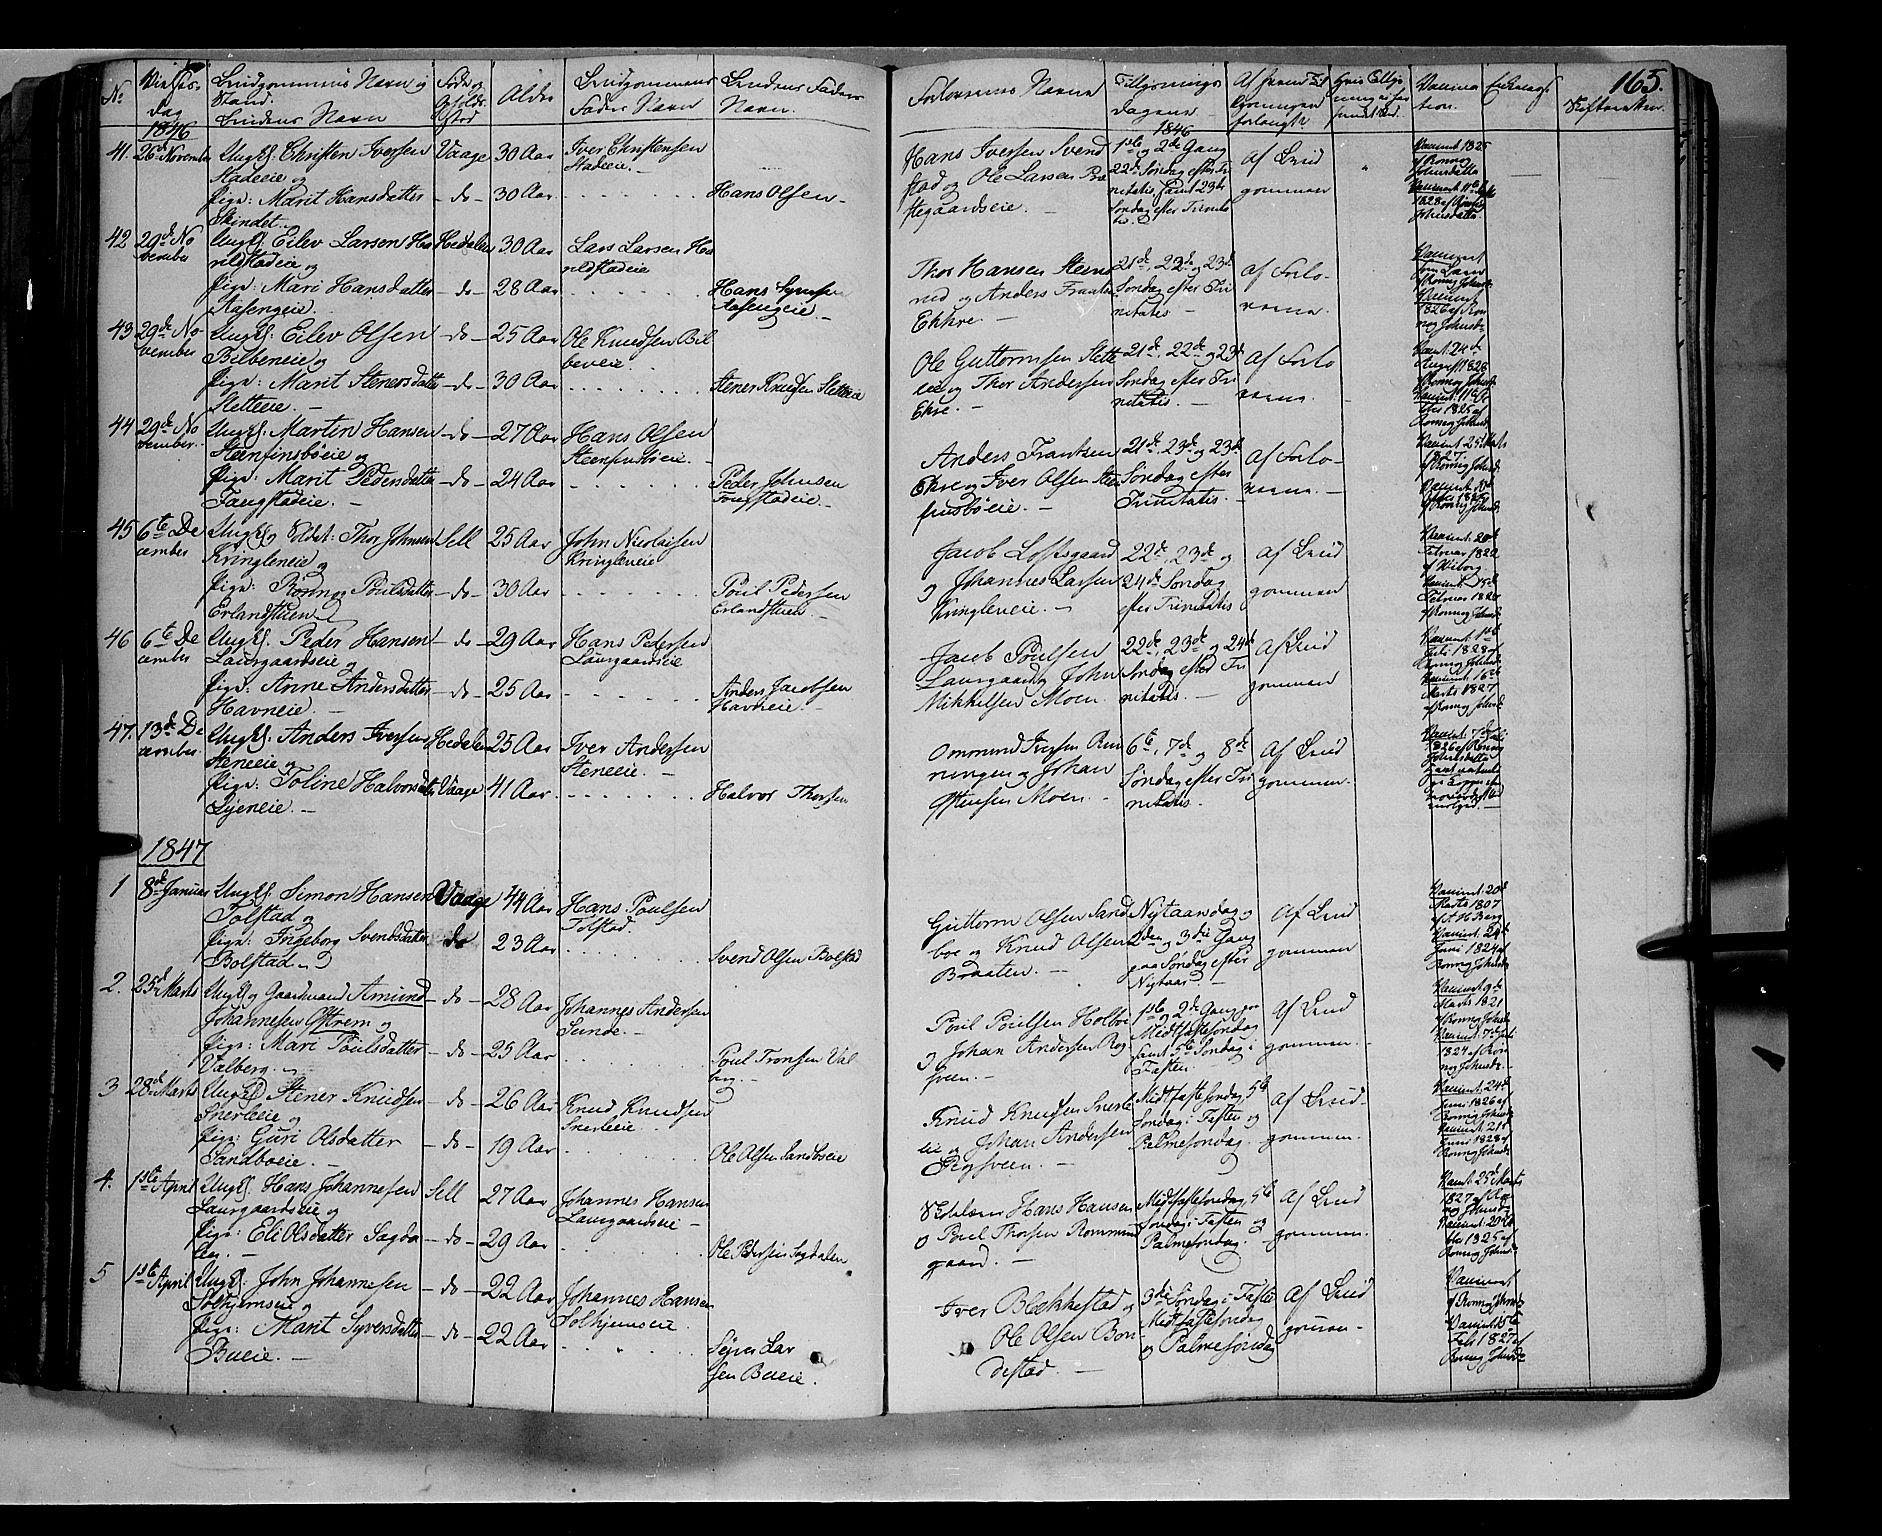 SAH, Vågå prestekontor, Ministerialbok nr. 5 /1, 1842-1856, s. 165